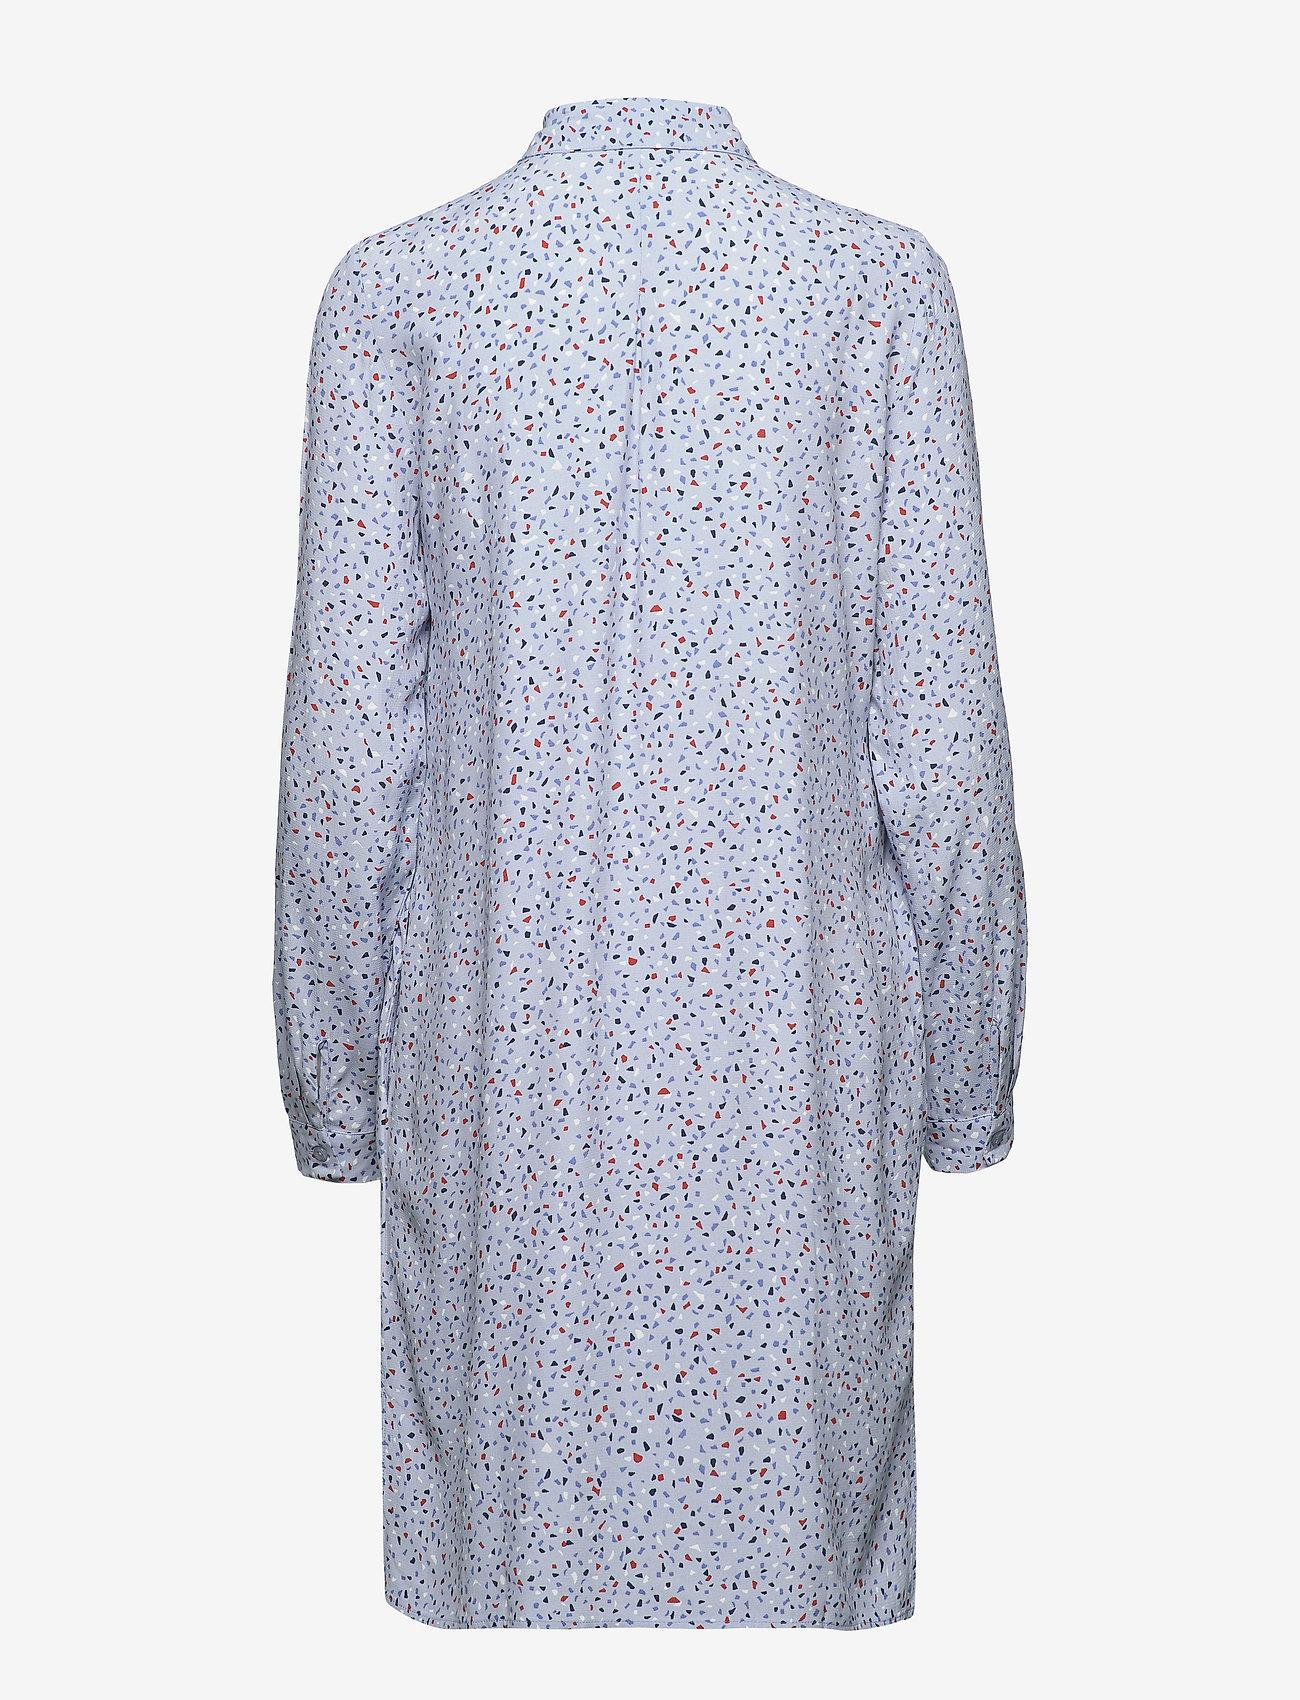 Nanso - Ladies shirt, Siru - robes chemises - grey - 1